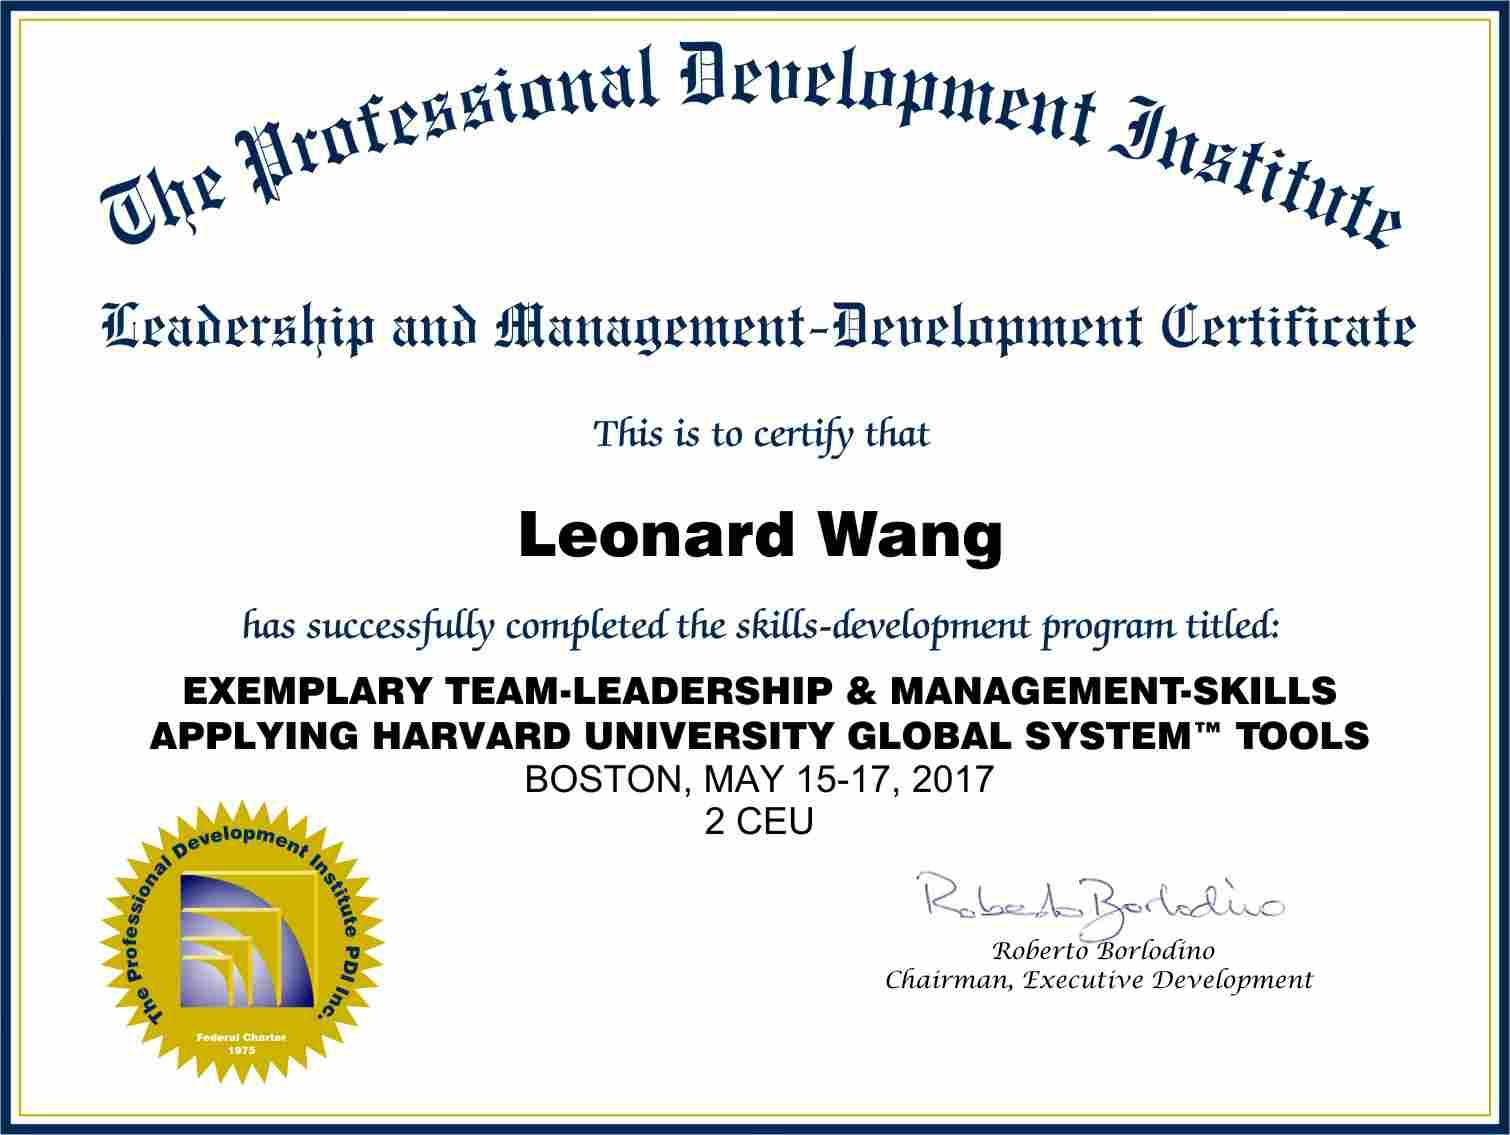 Team Leadership And Management Workshop With Harvard University System